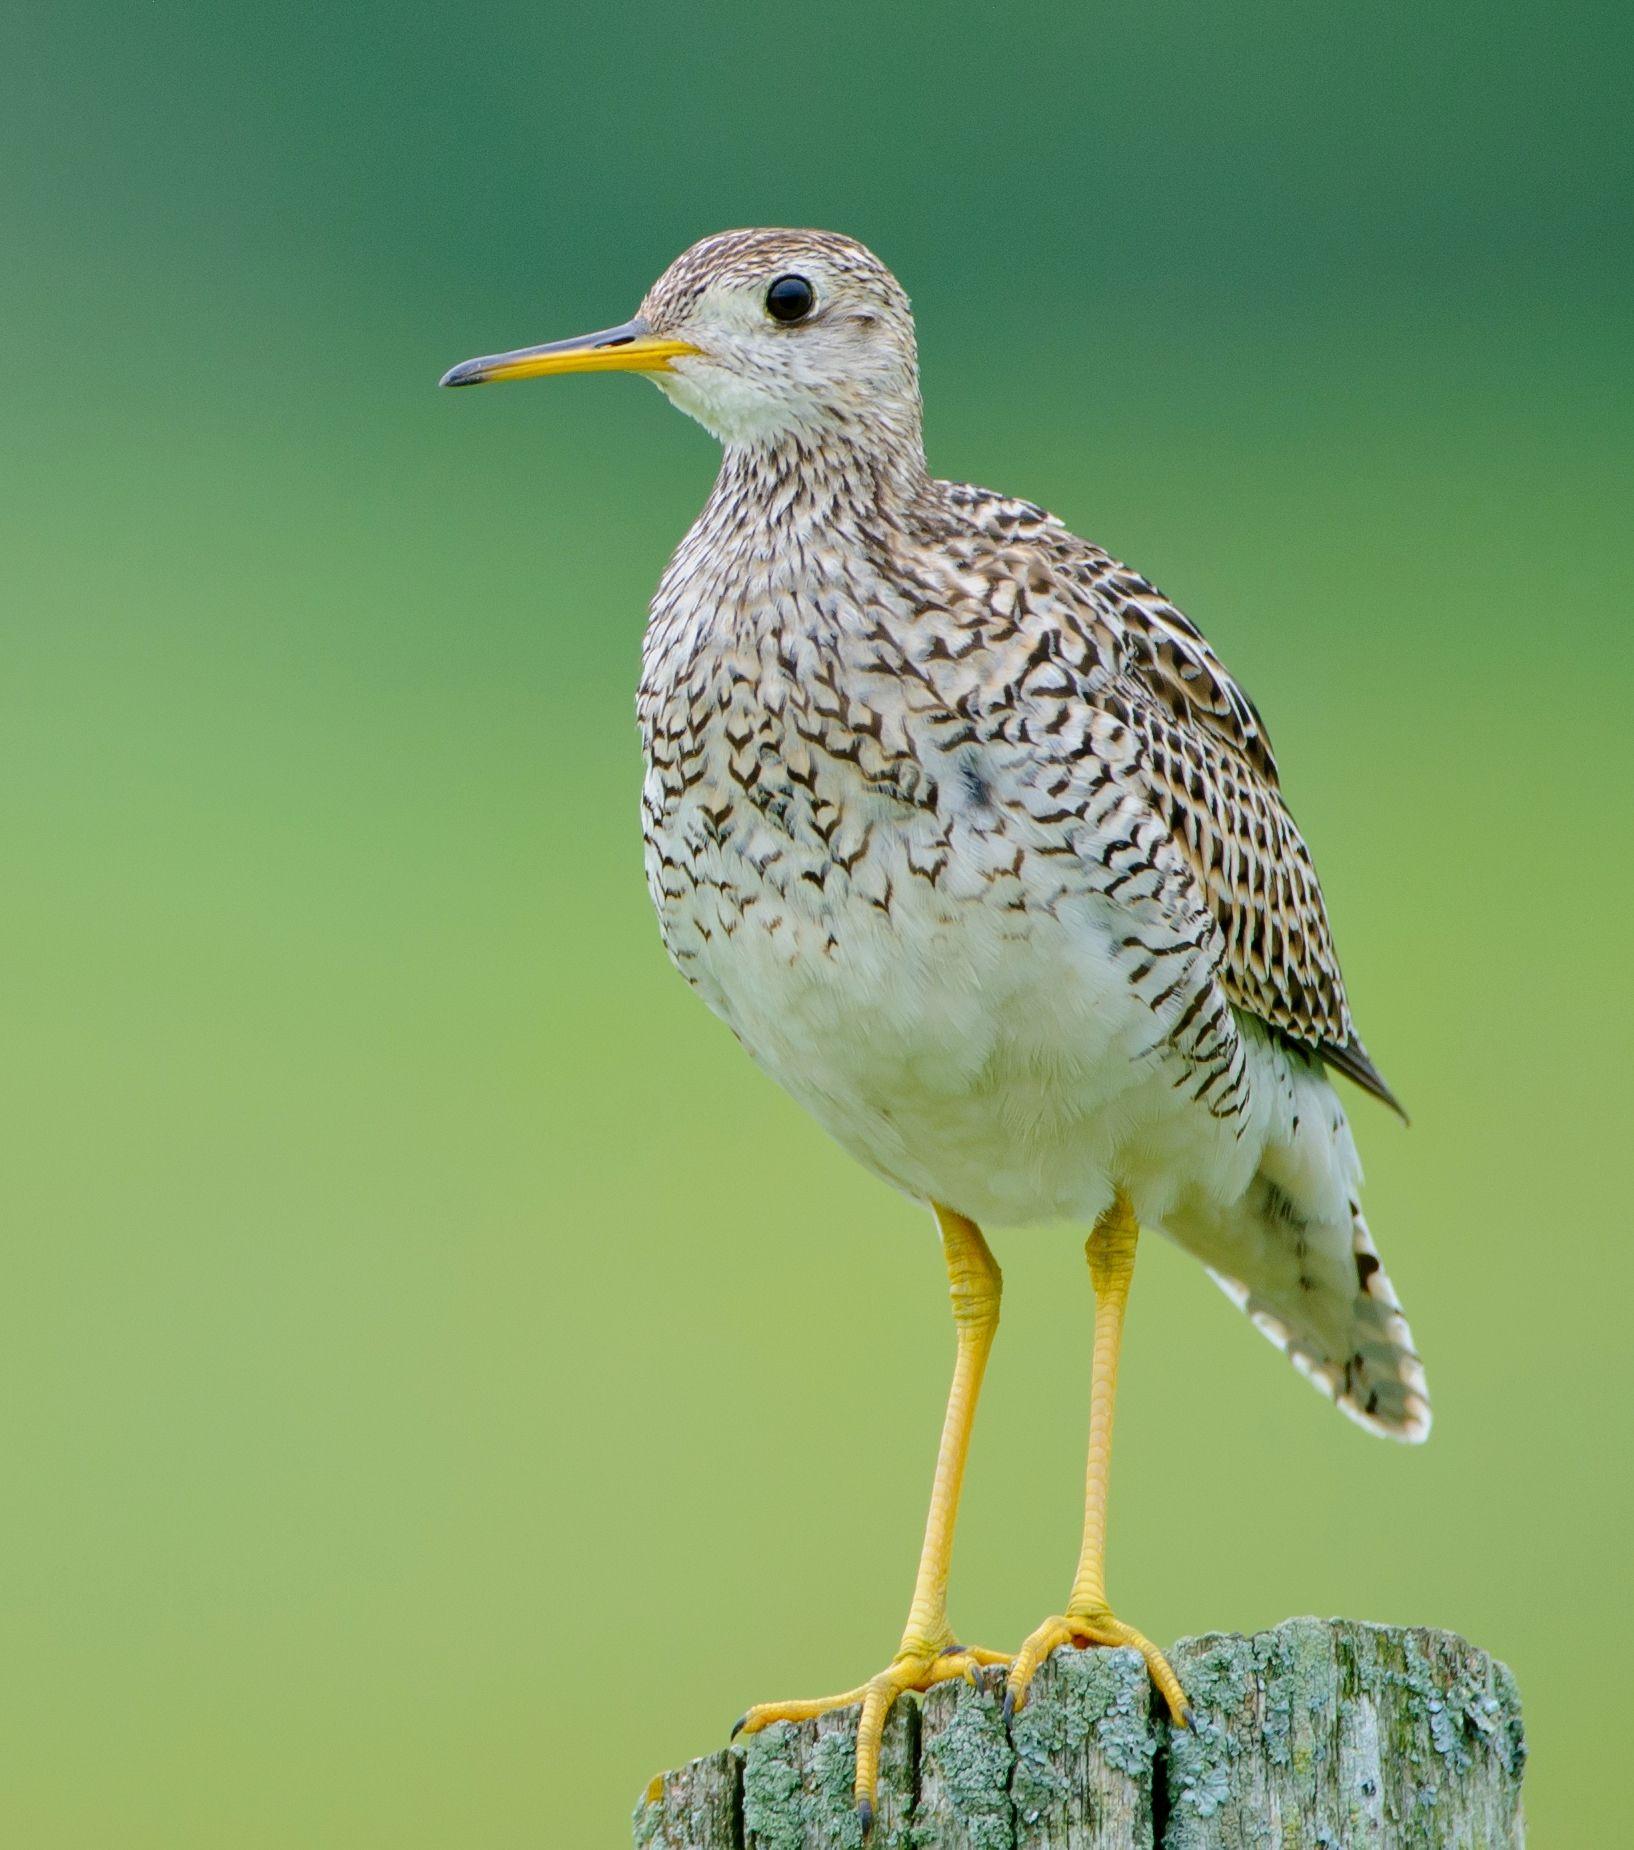 Birds, List of birds, Beautiful birds